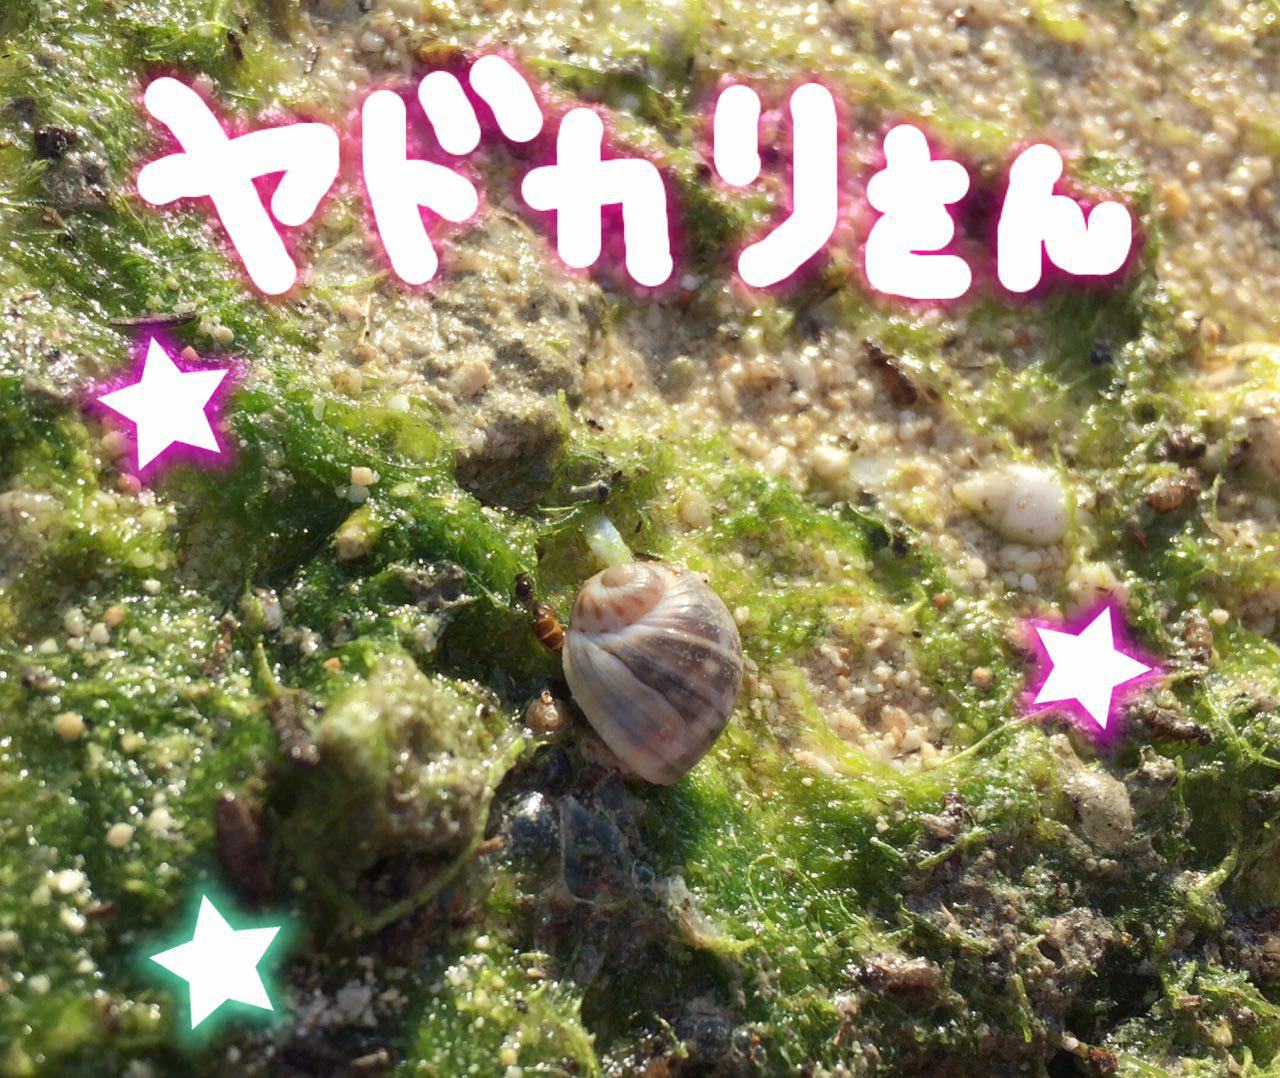 photo_2017-06-08_20-13-31.jpg